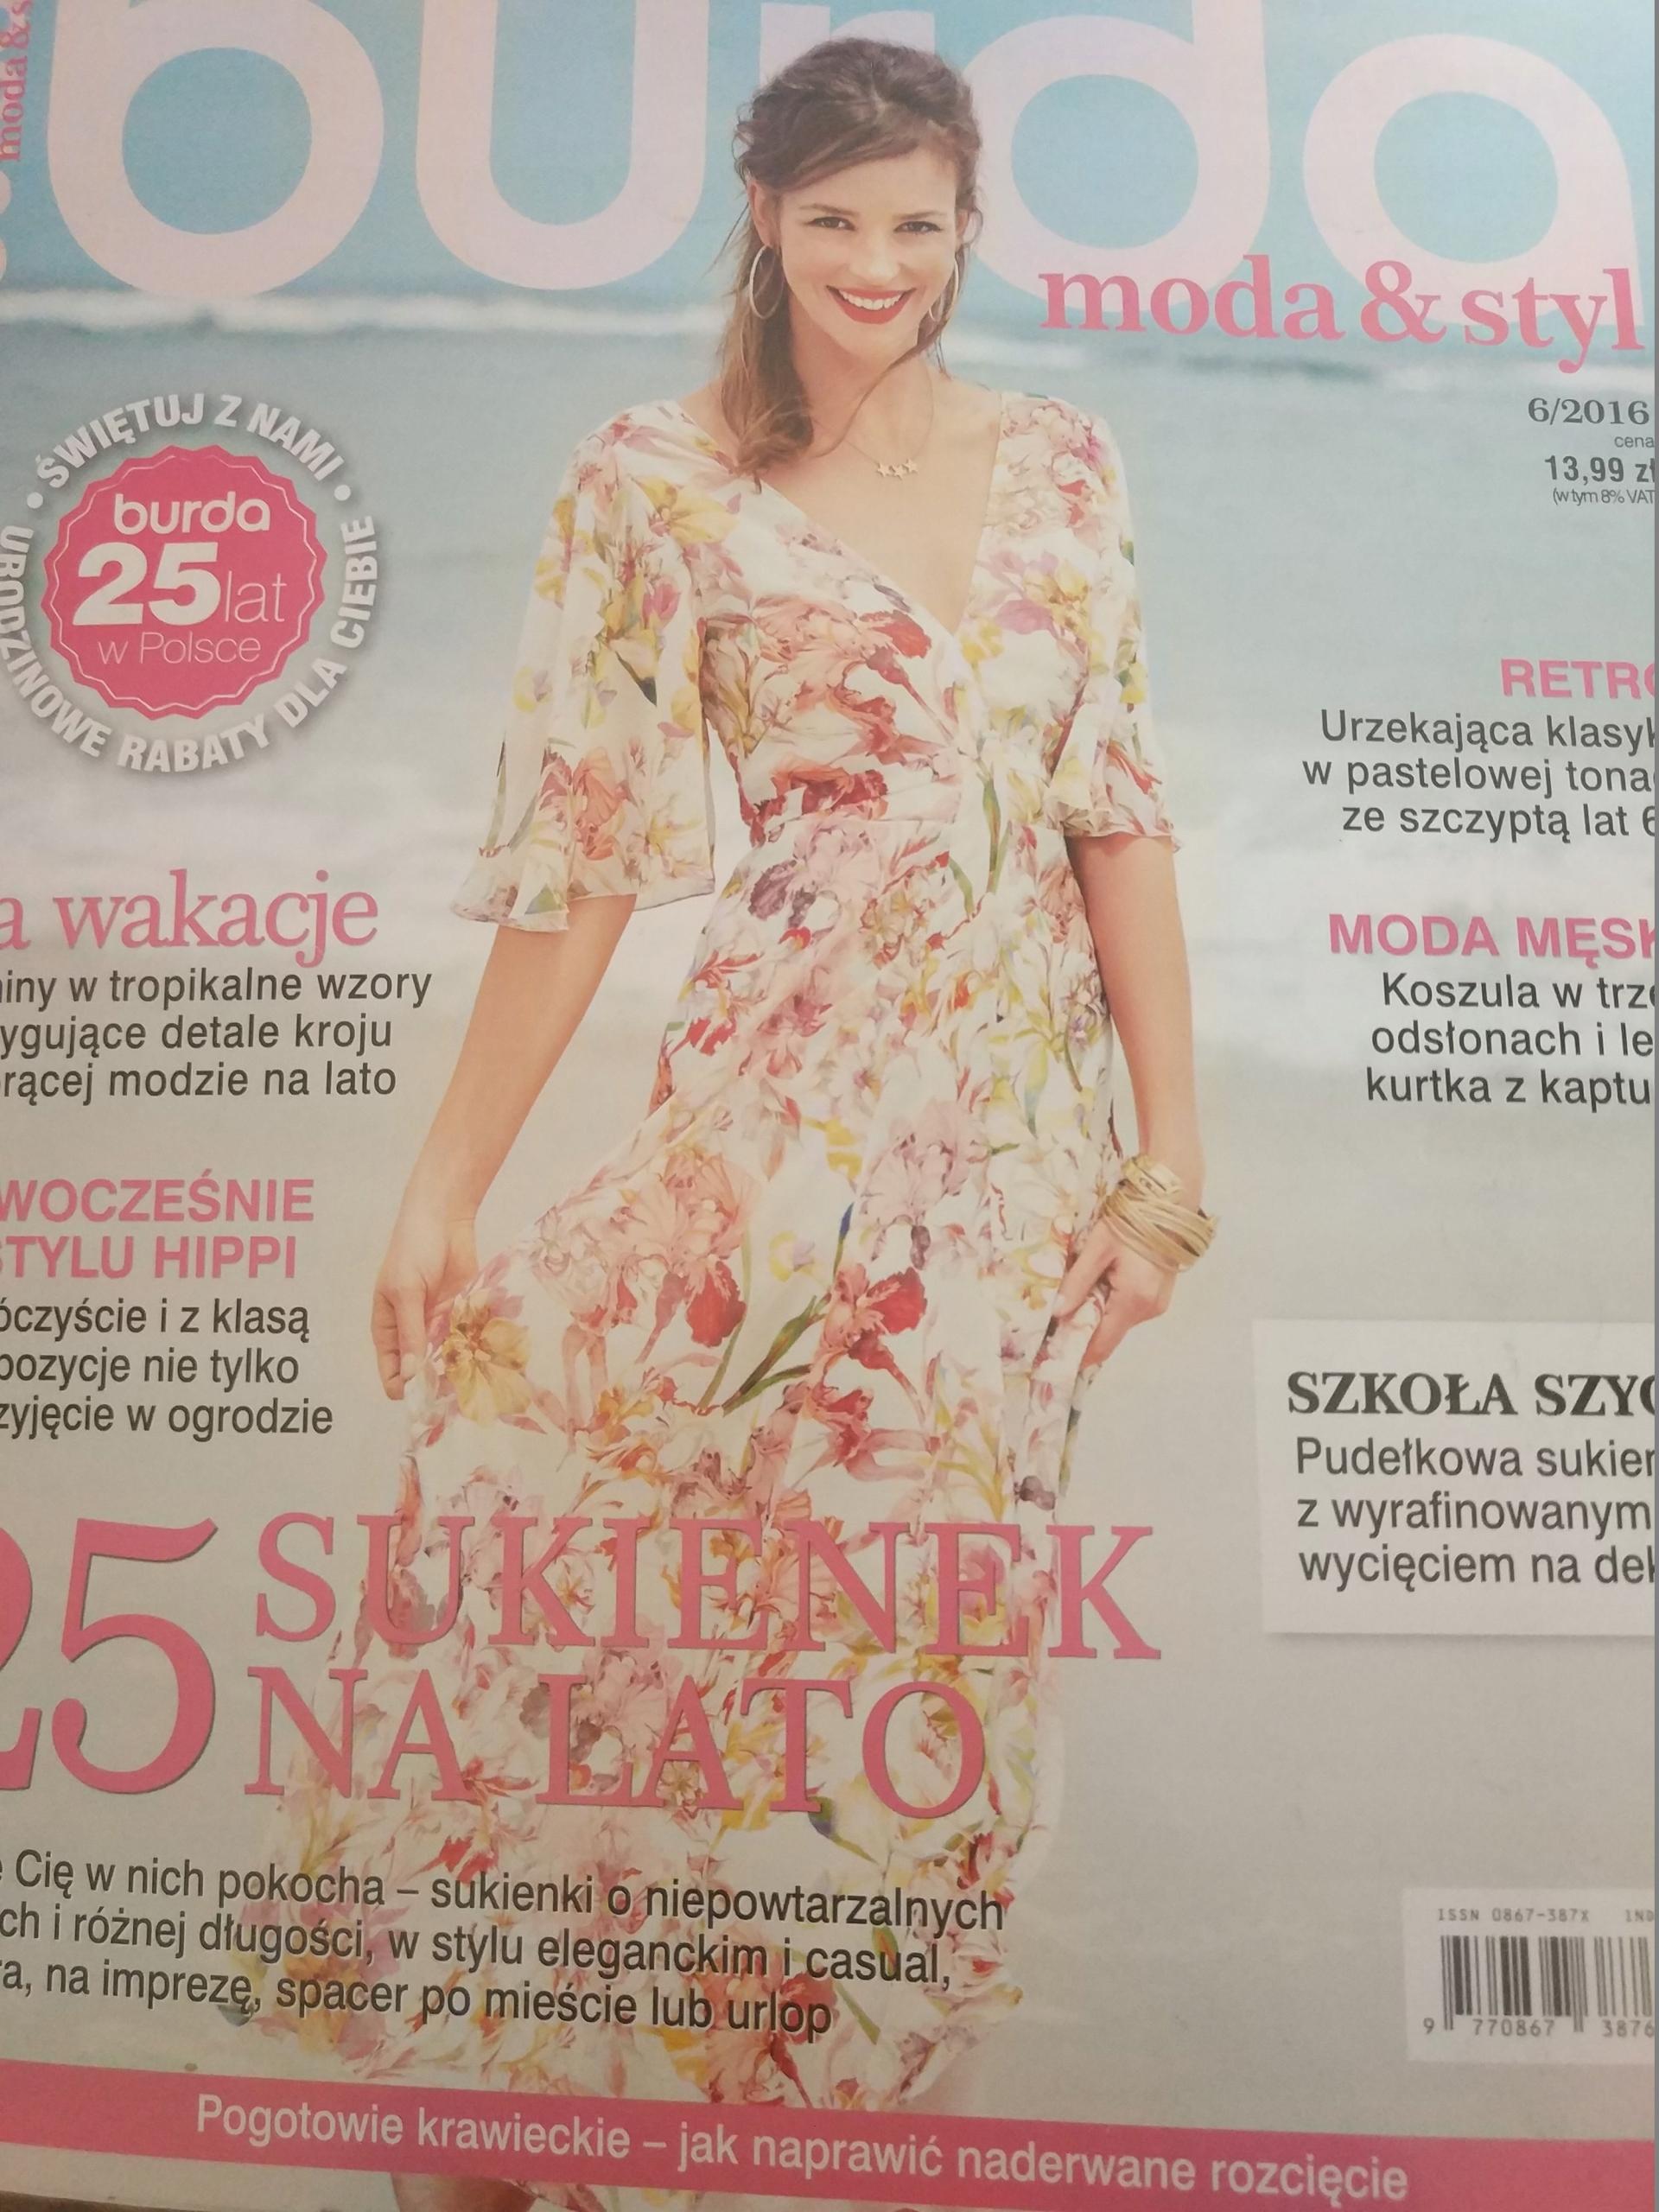 df3068bc474e czasopisma moda w Oficjalnym Archiwum Allegro - archiwum ofert